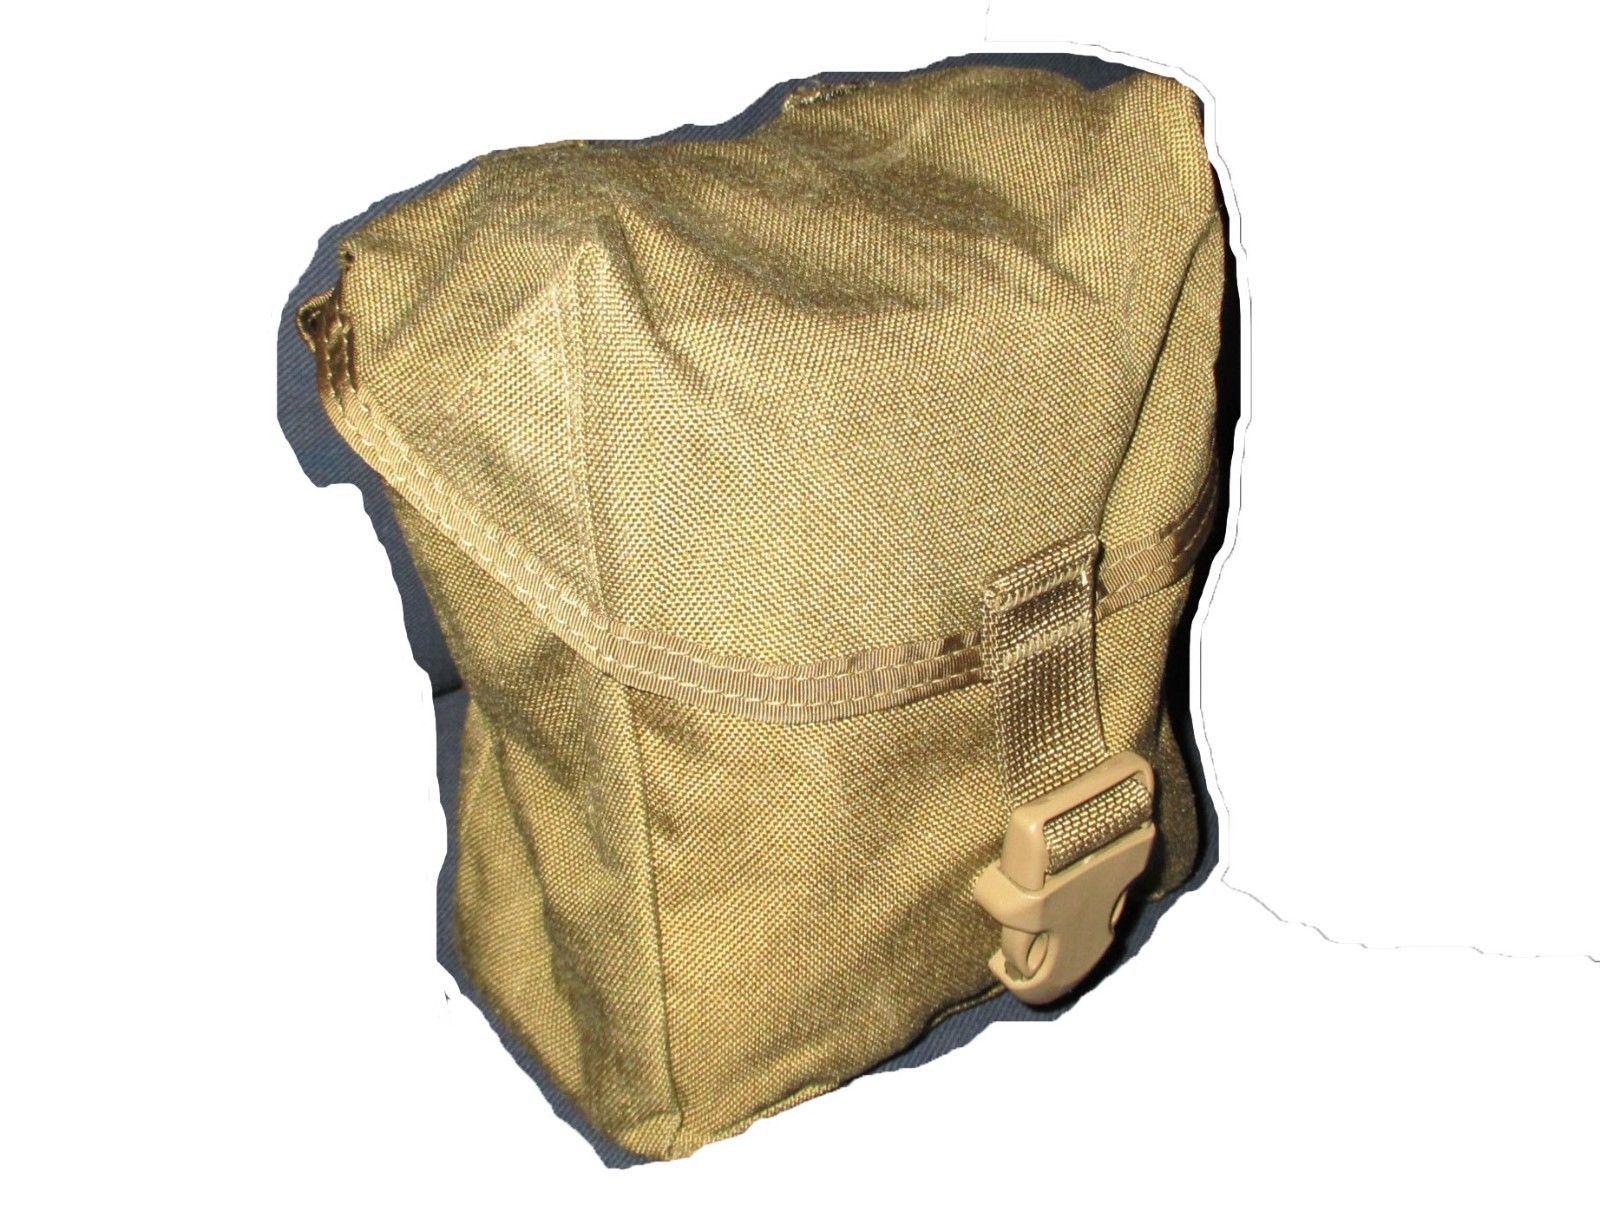 12 Pieces+ Set Us Army Usmc Ifak Military and 50 similar items